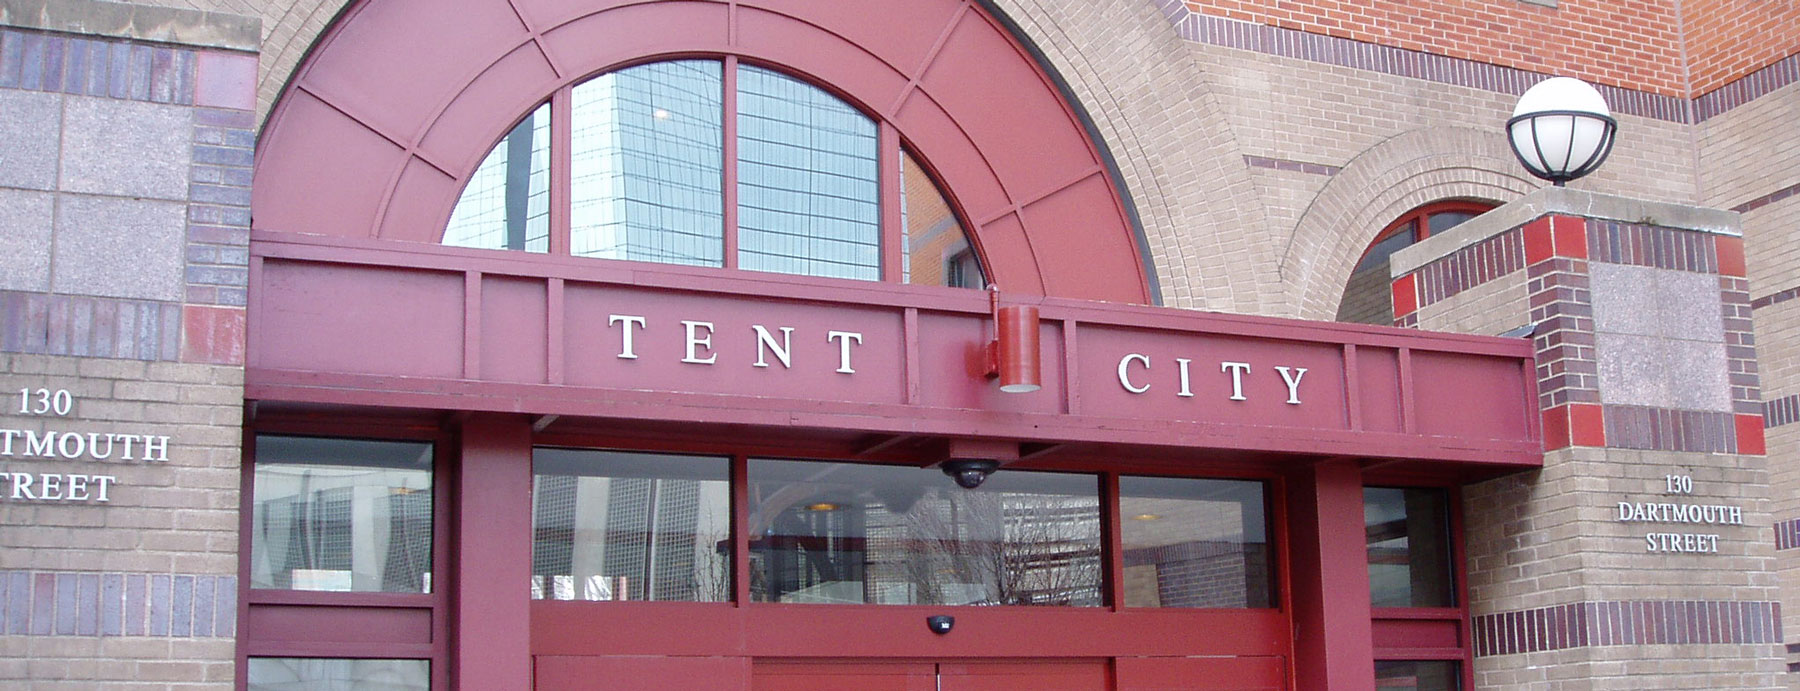 Activists Erect Tent City in Boston